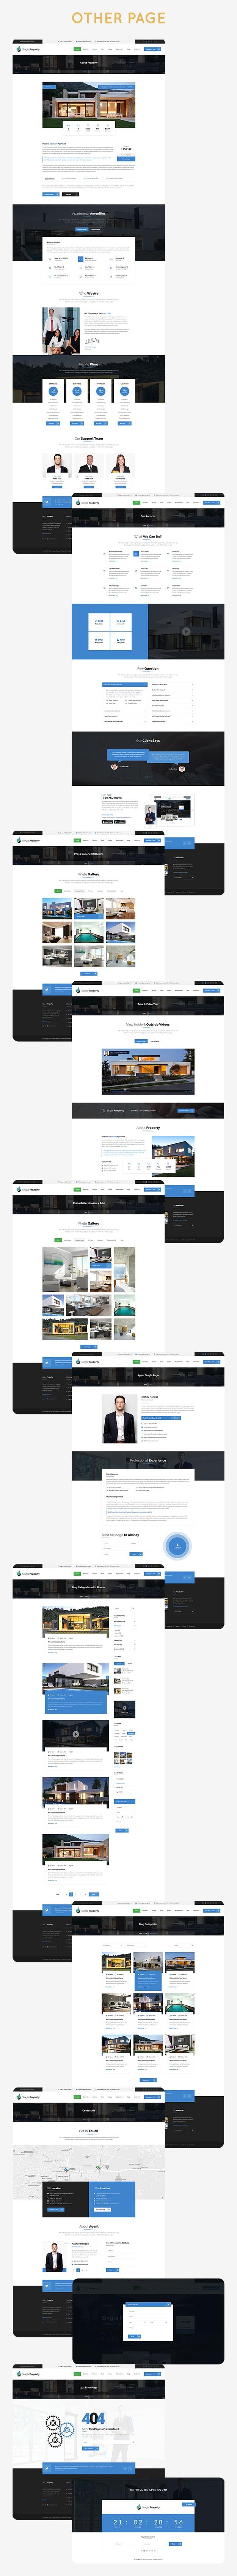 PatelProperty - Single Property Immobilien WordPress Theme - 7